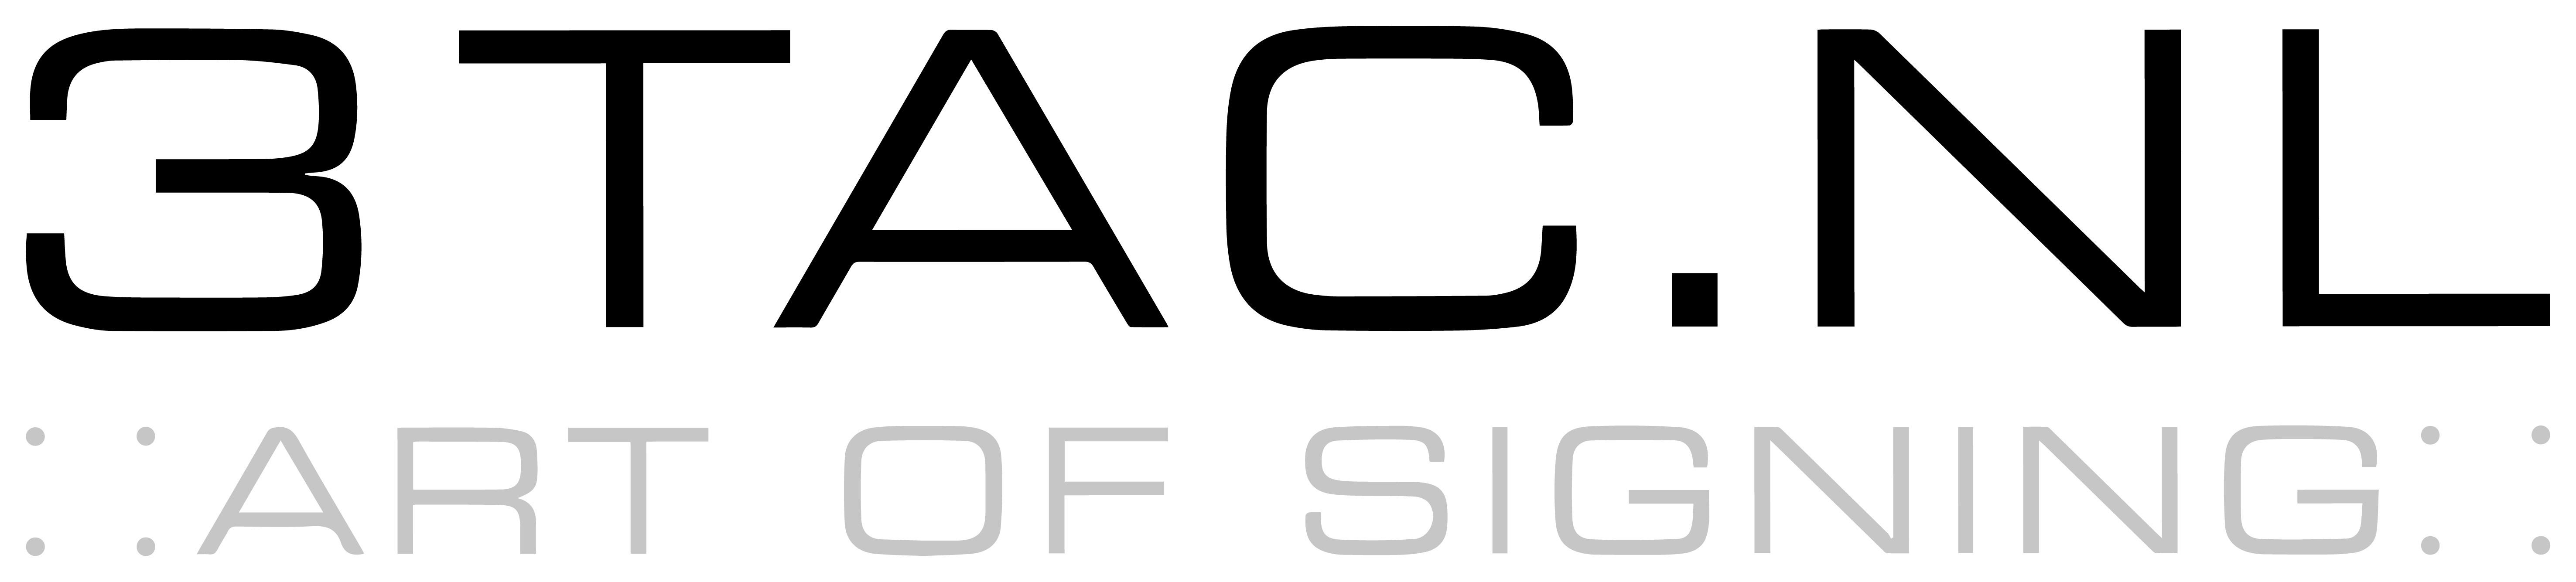 3 TAC logo Tekengebied 1